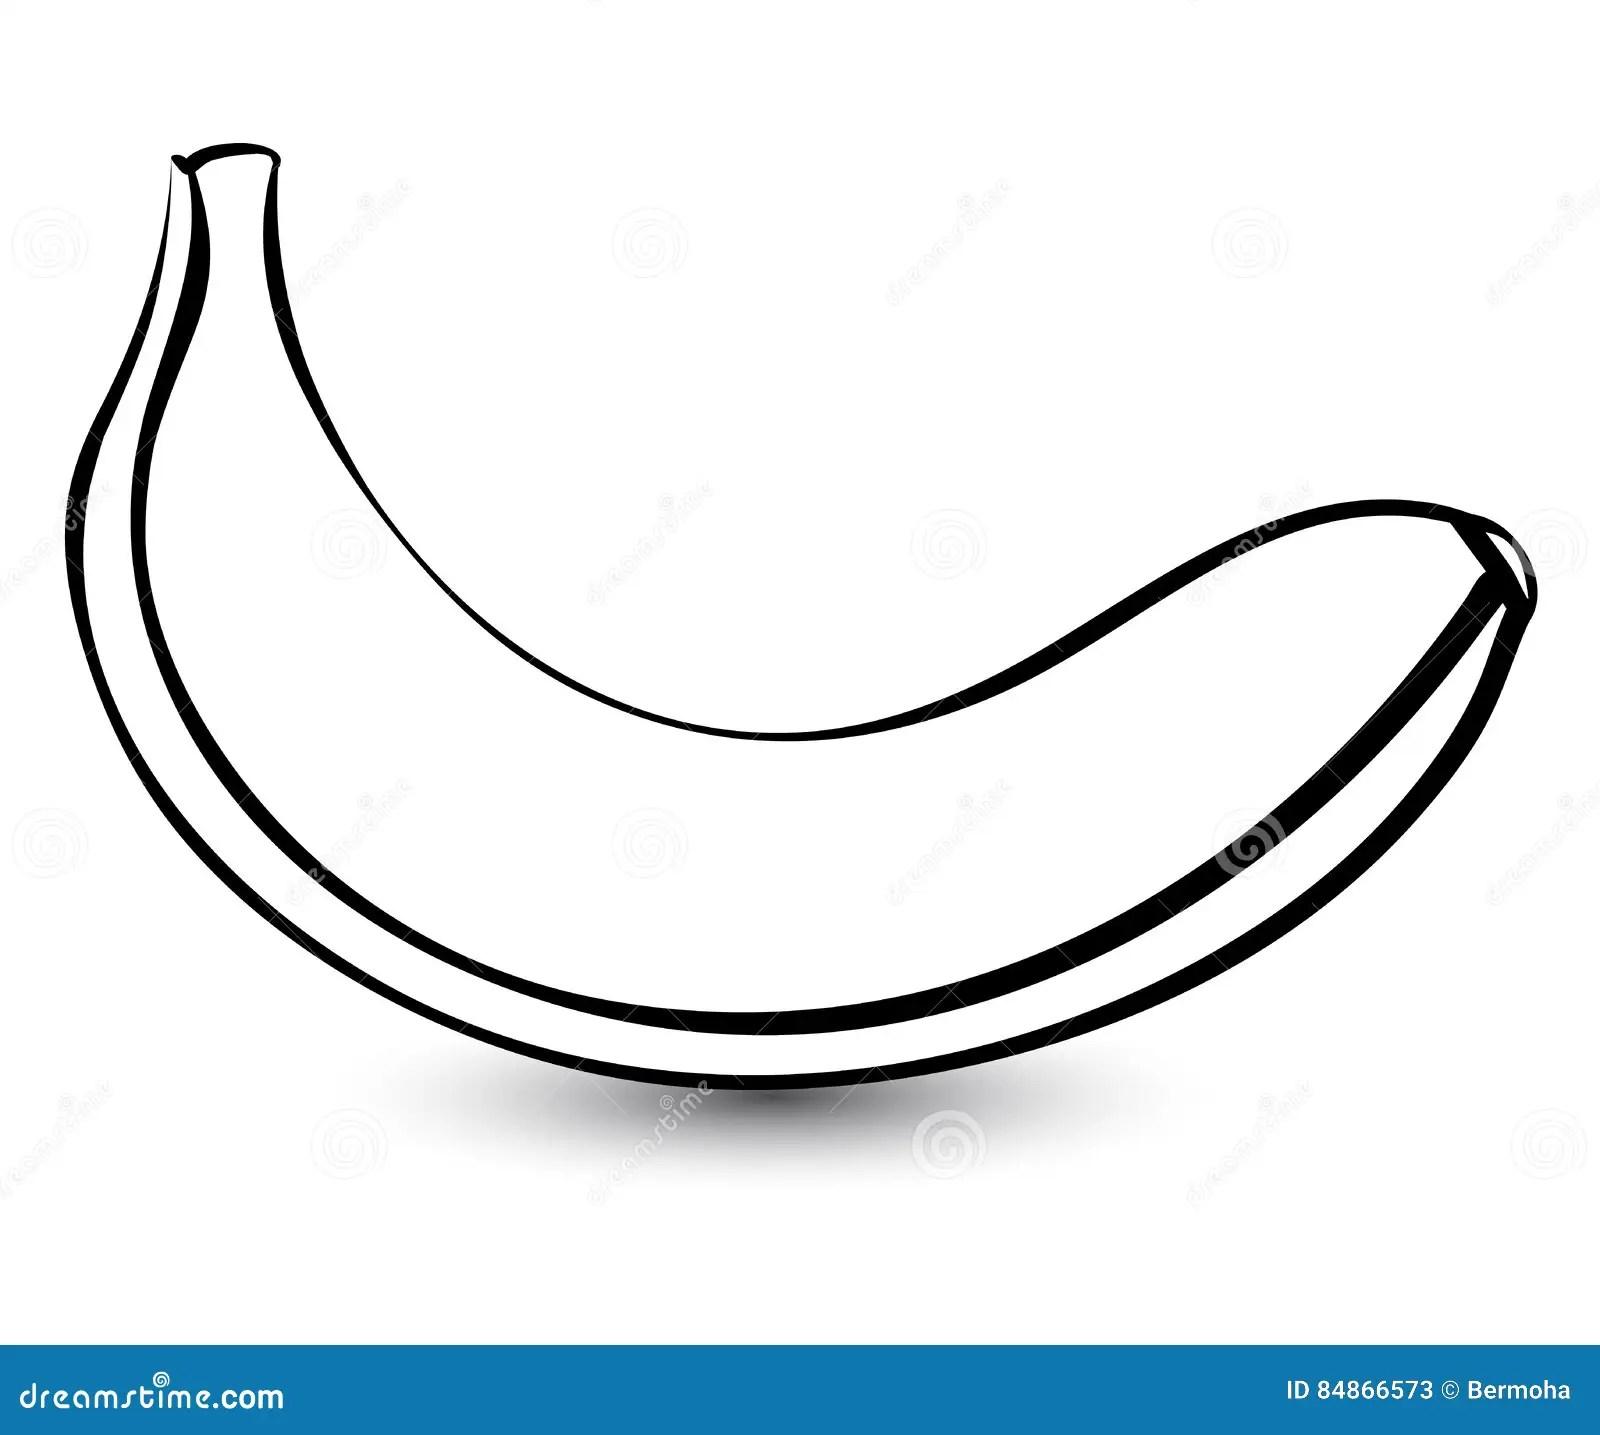 Outline Sketch Monochrome Banana Stock Vector